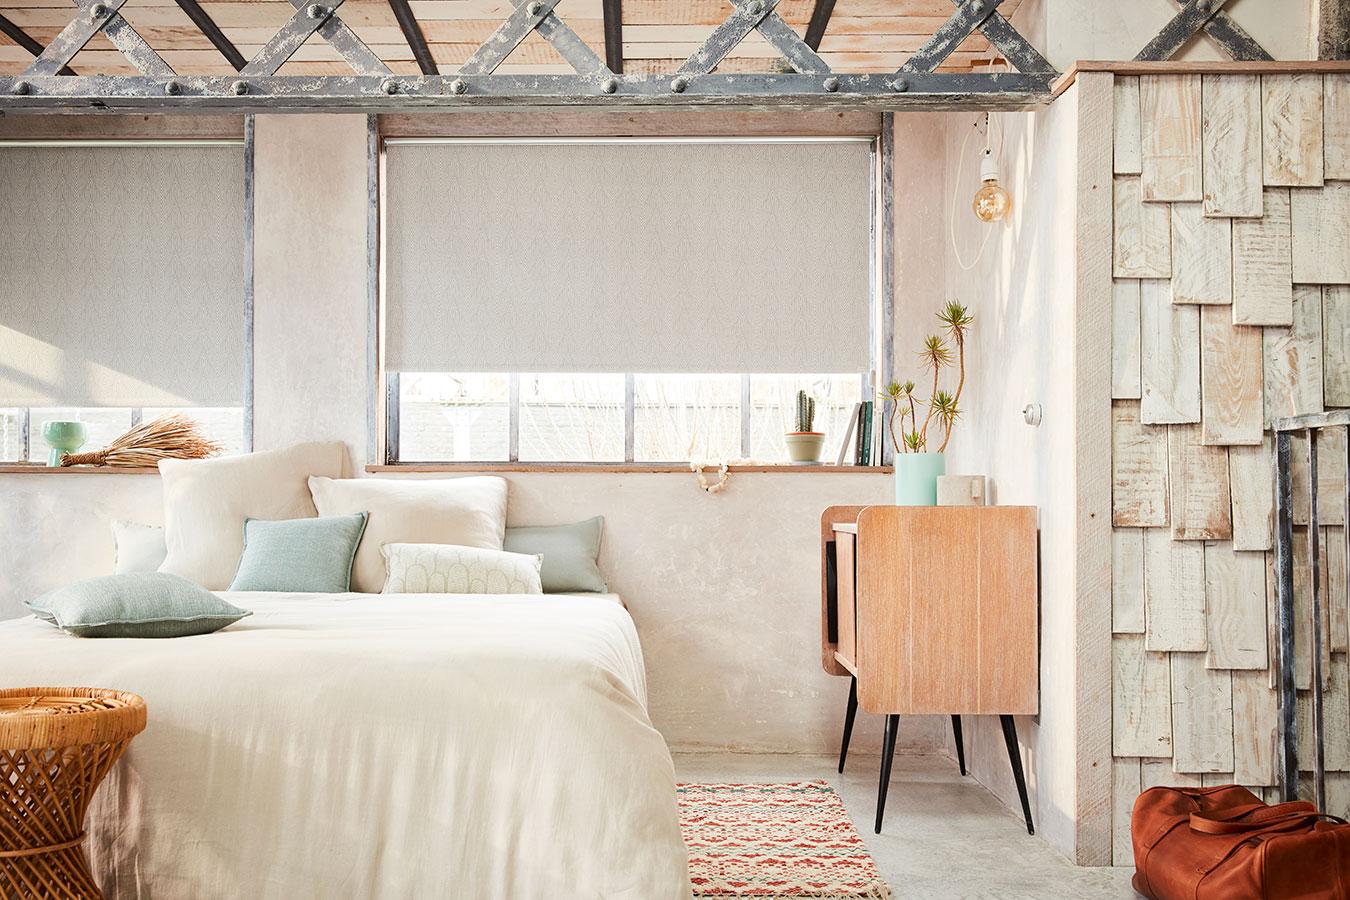 Store enrouleur MANDABO chambre à coucher heytens